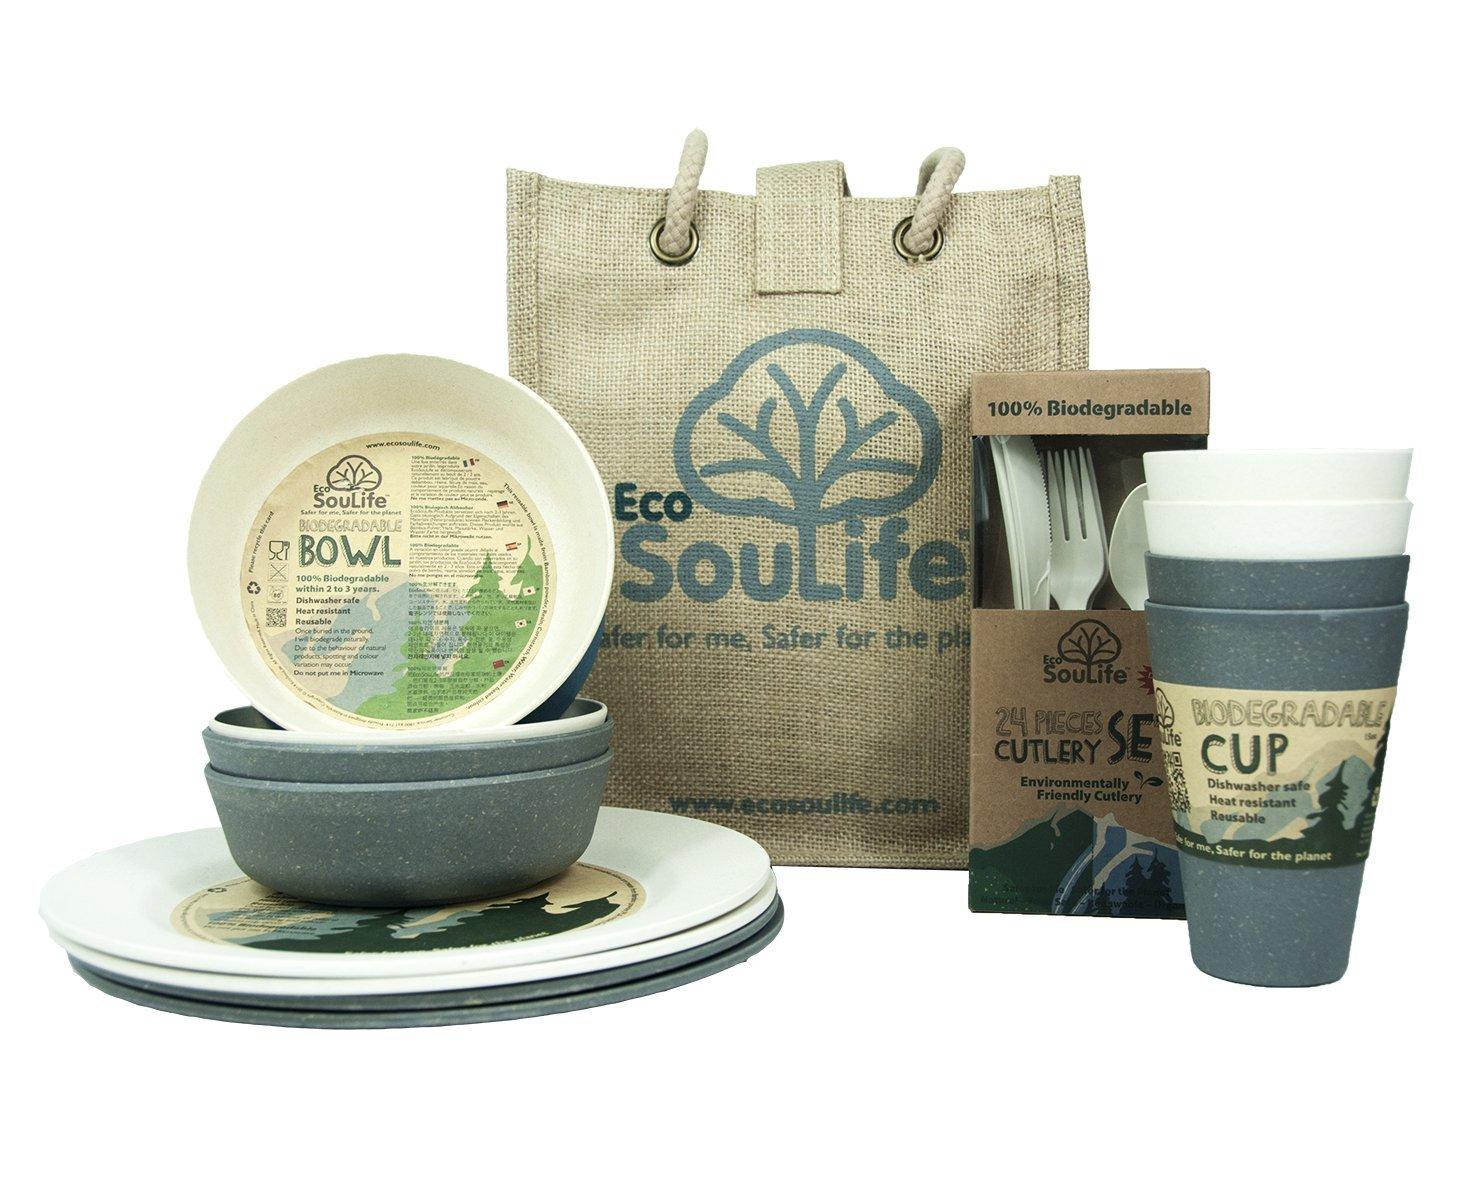 EcoSouLife Biodegradable Picnic Set